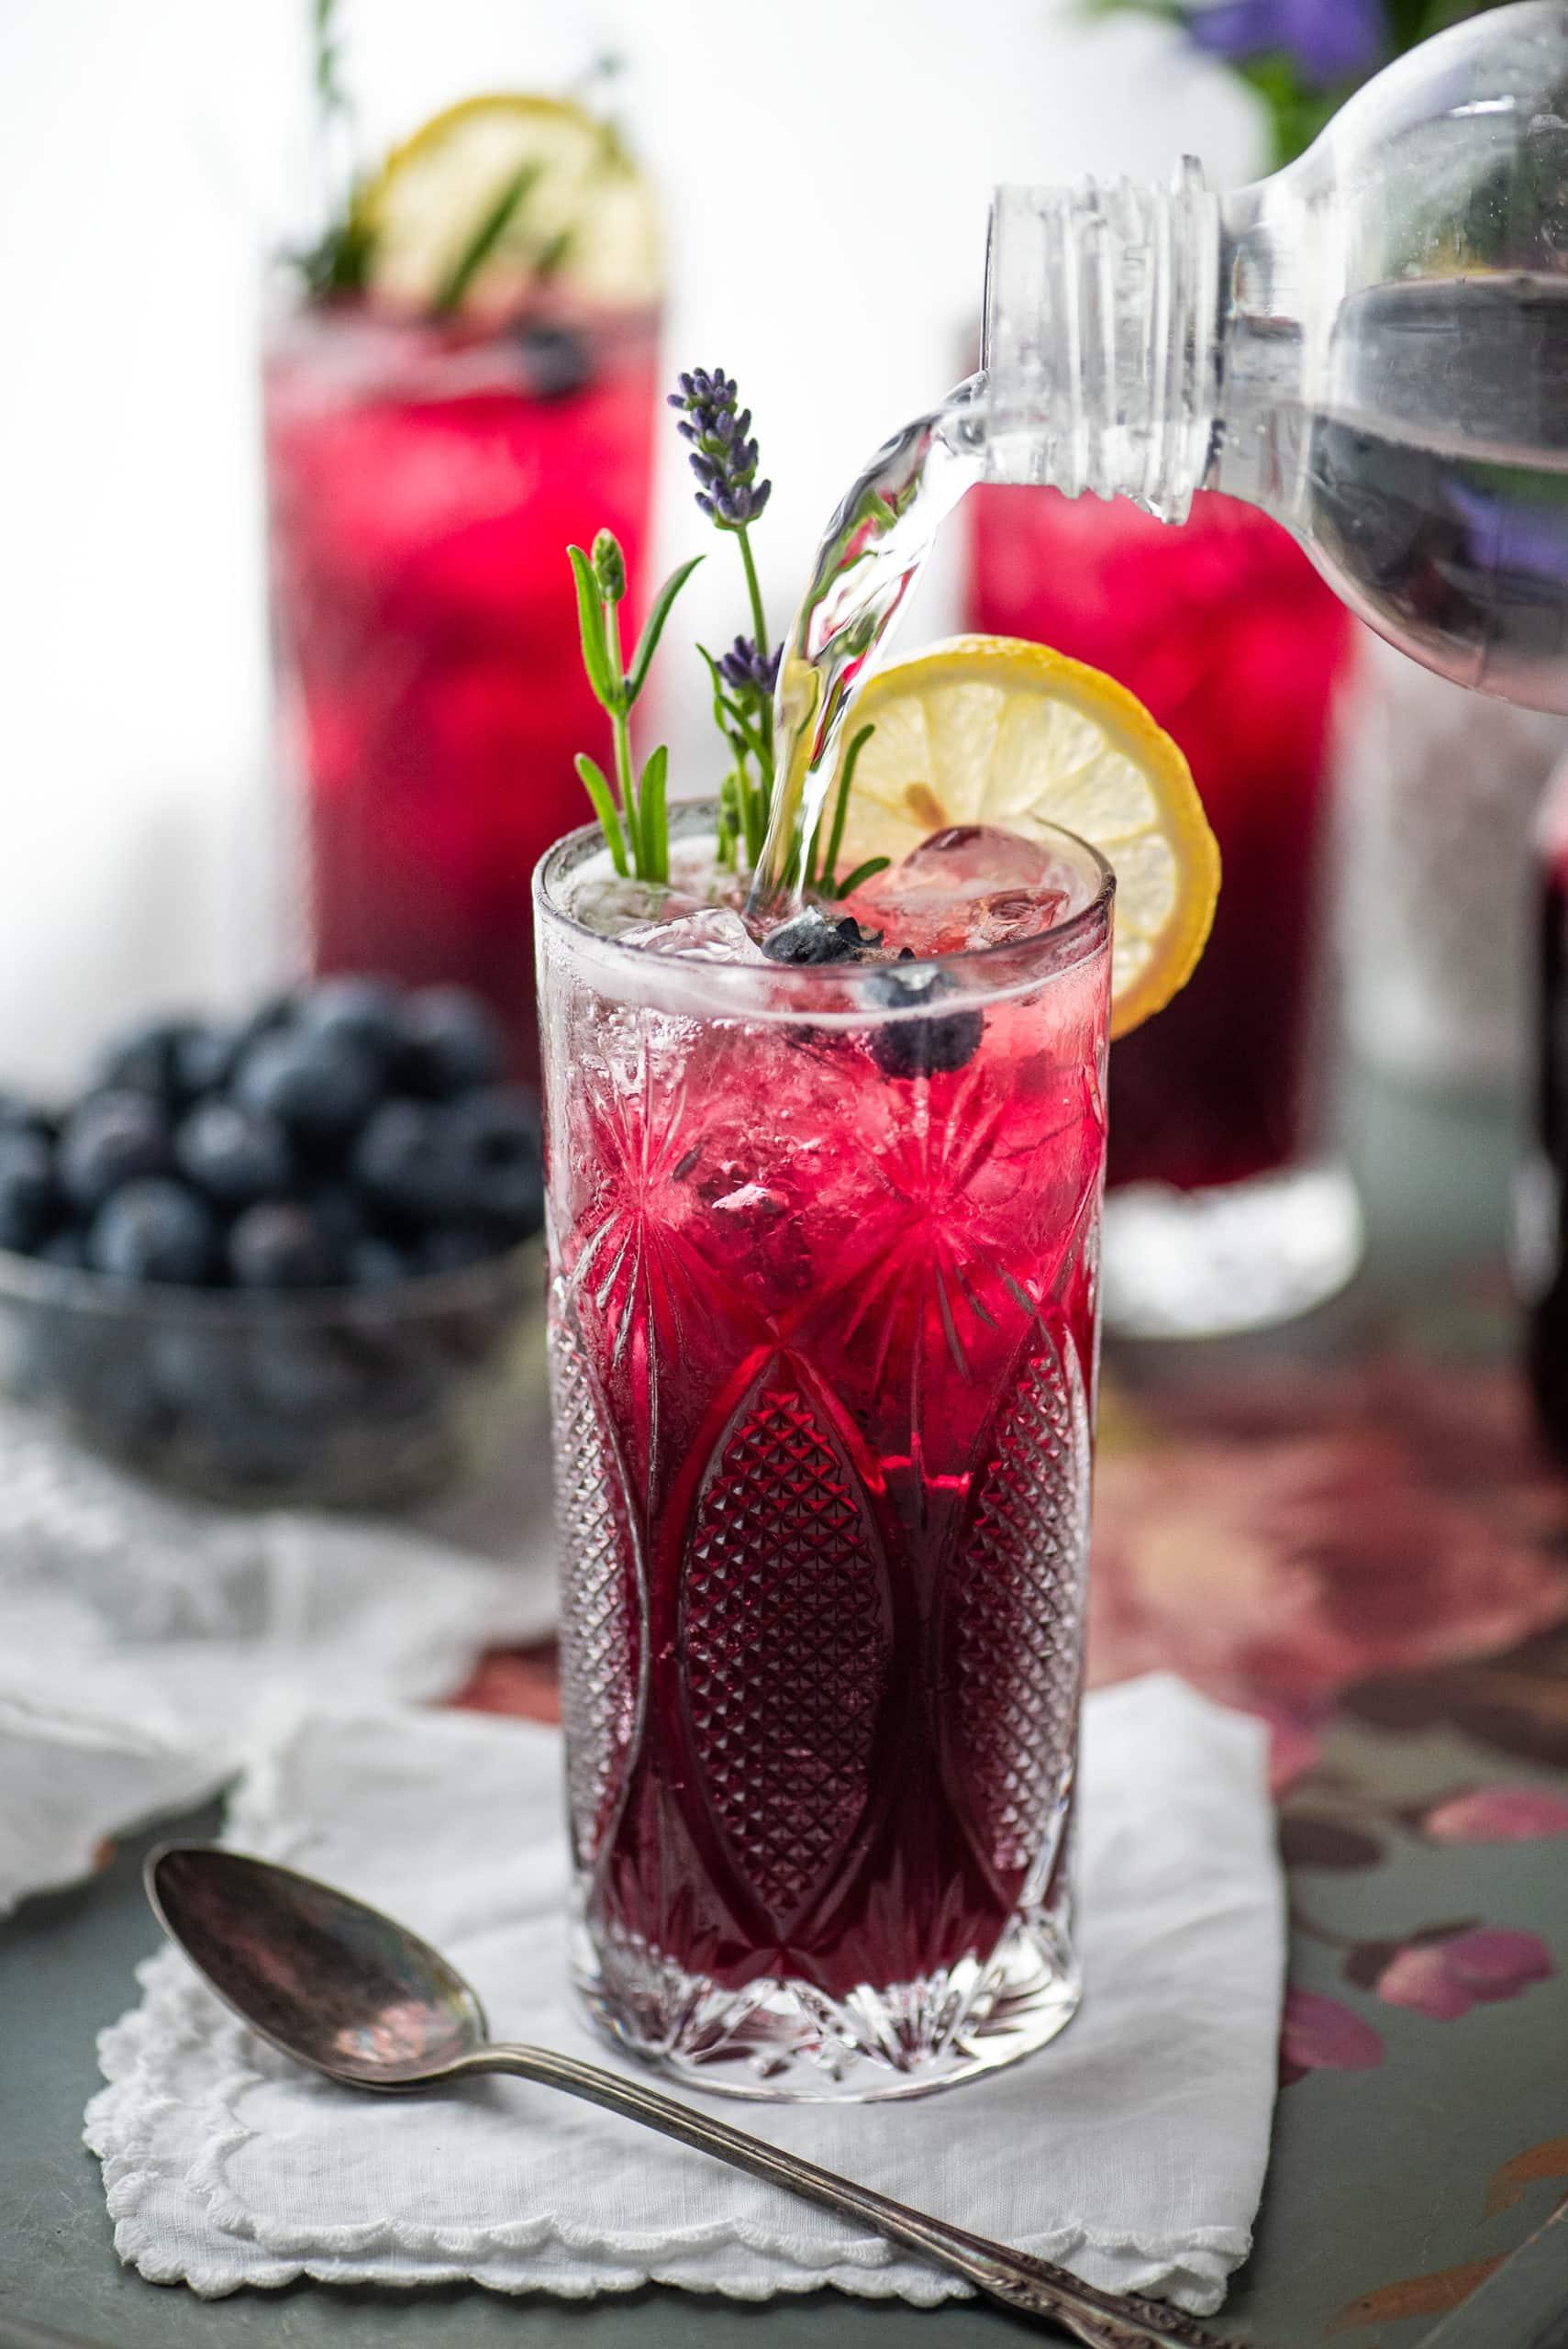 Blueberry Lavender Soda 6915 scaled - Blueberry Lavender Soda